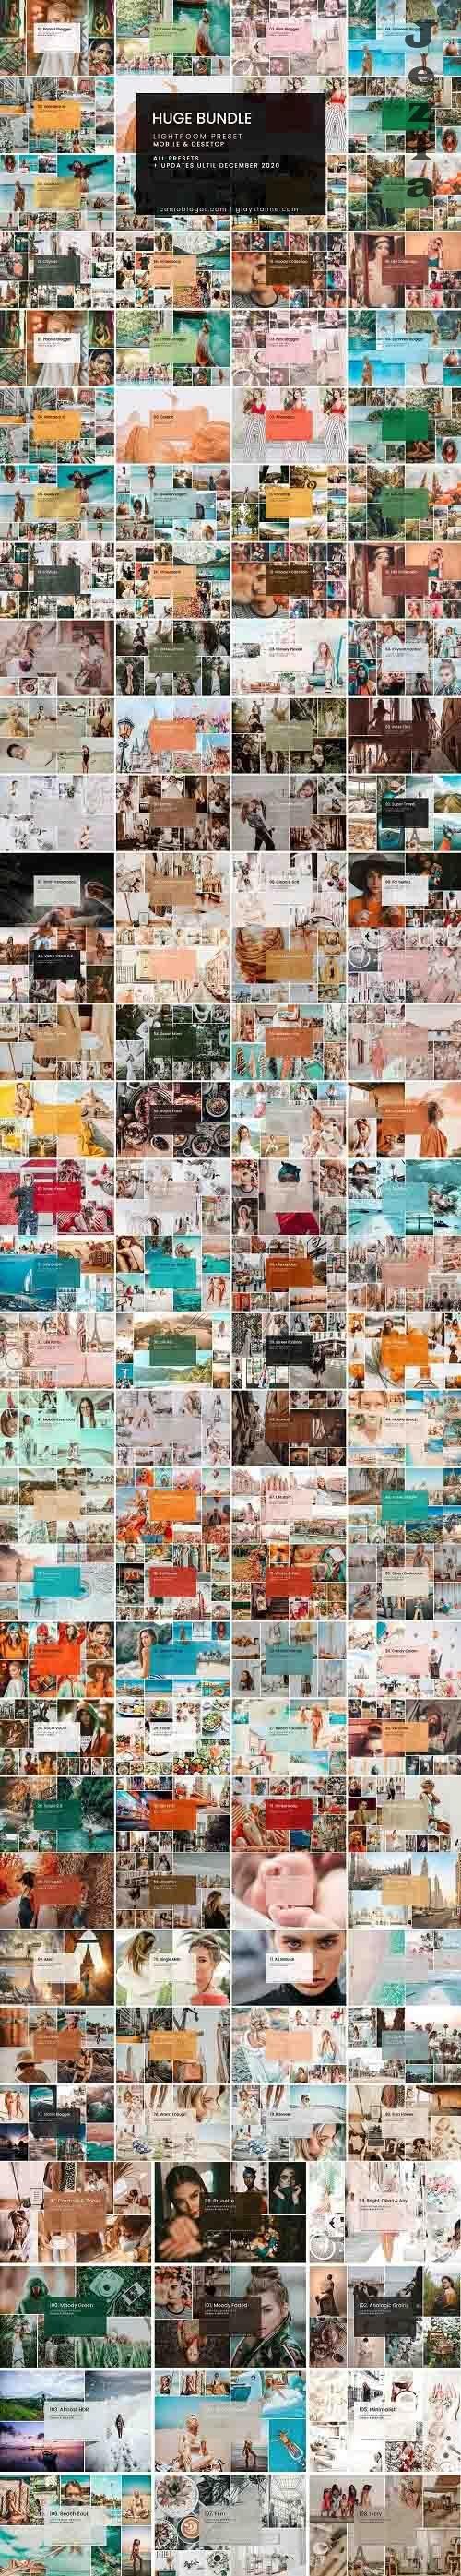 CreativeMarket - HUGE Bundle Presets (108 Packs) 4680407